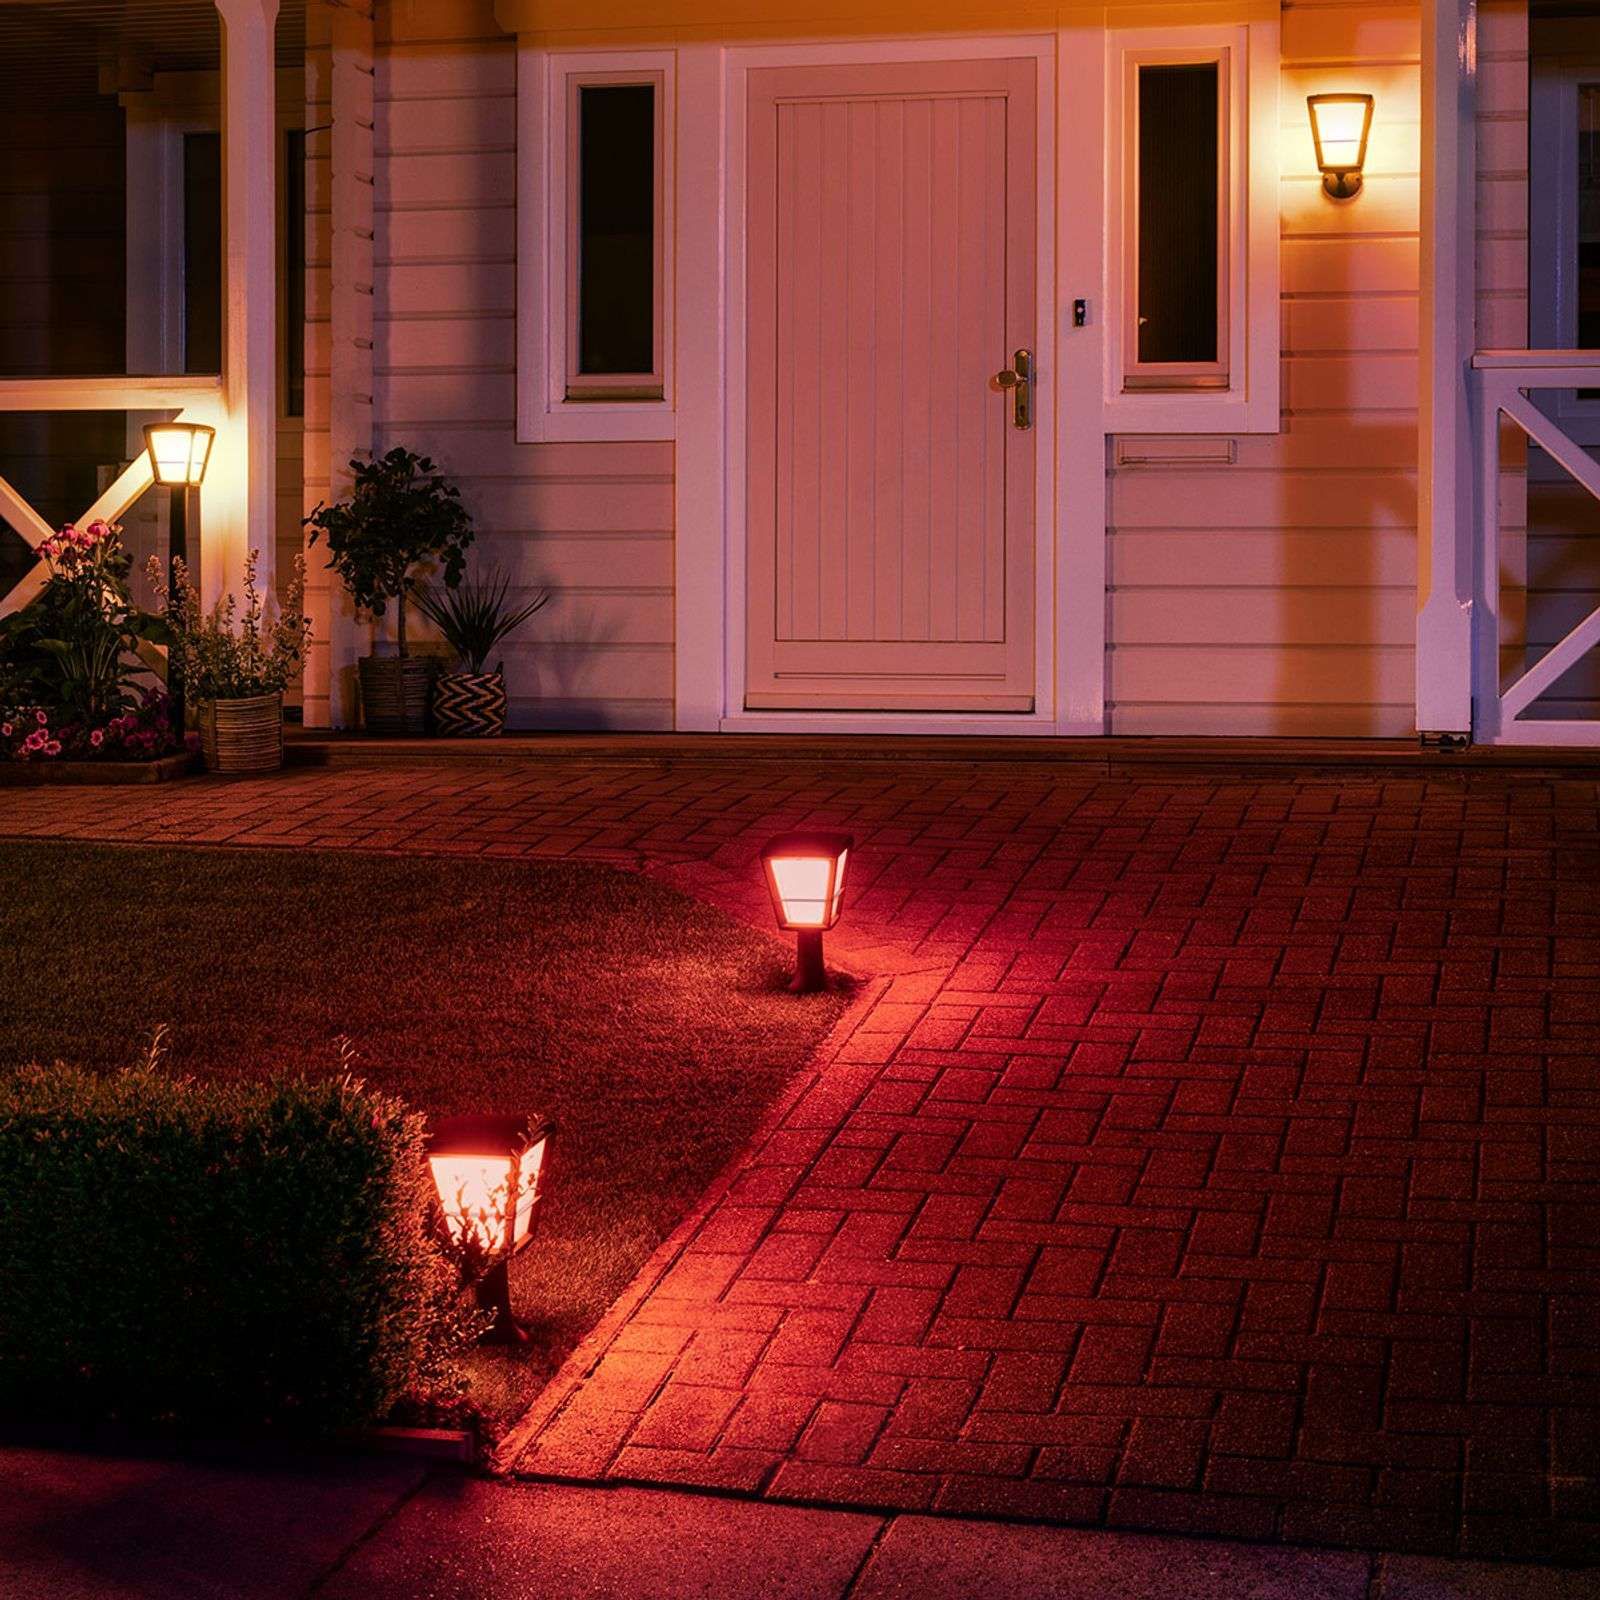 Philips Hue White+Color Econic LED pillar light-7534119-02